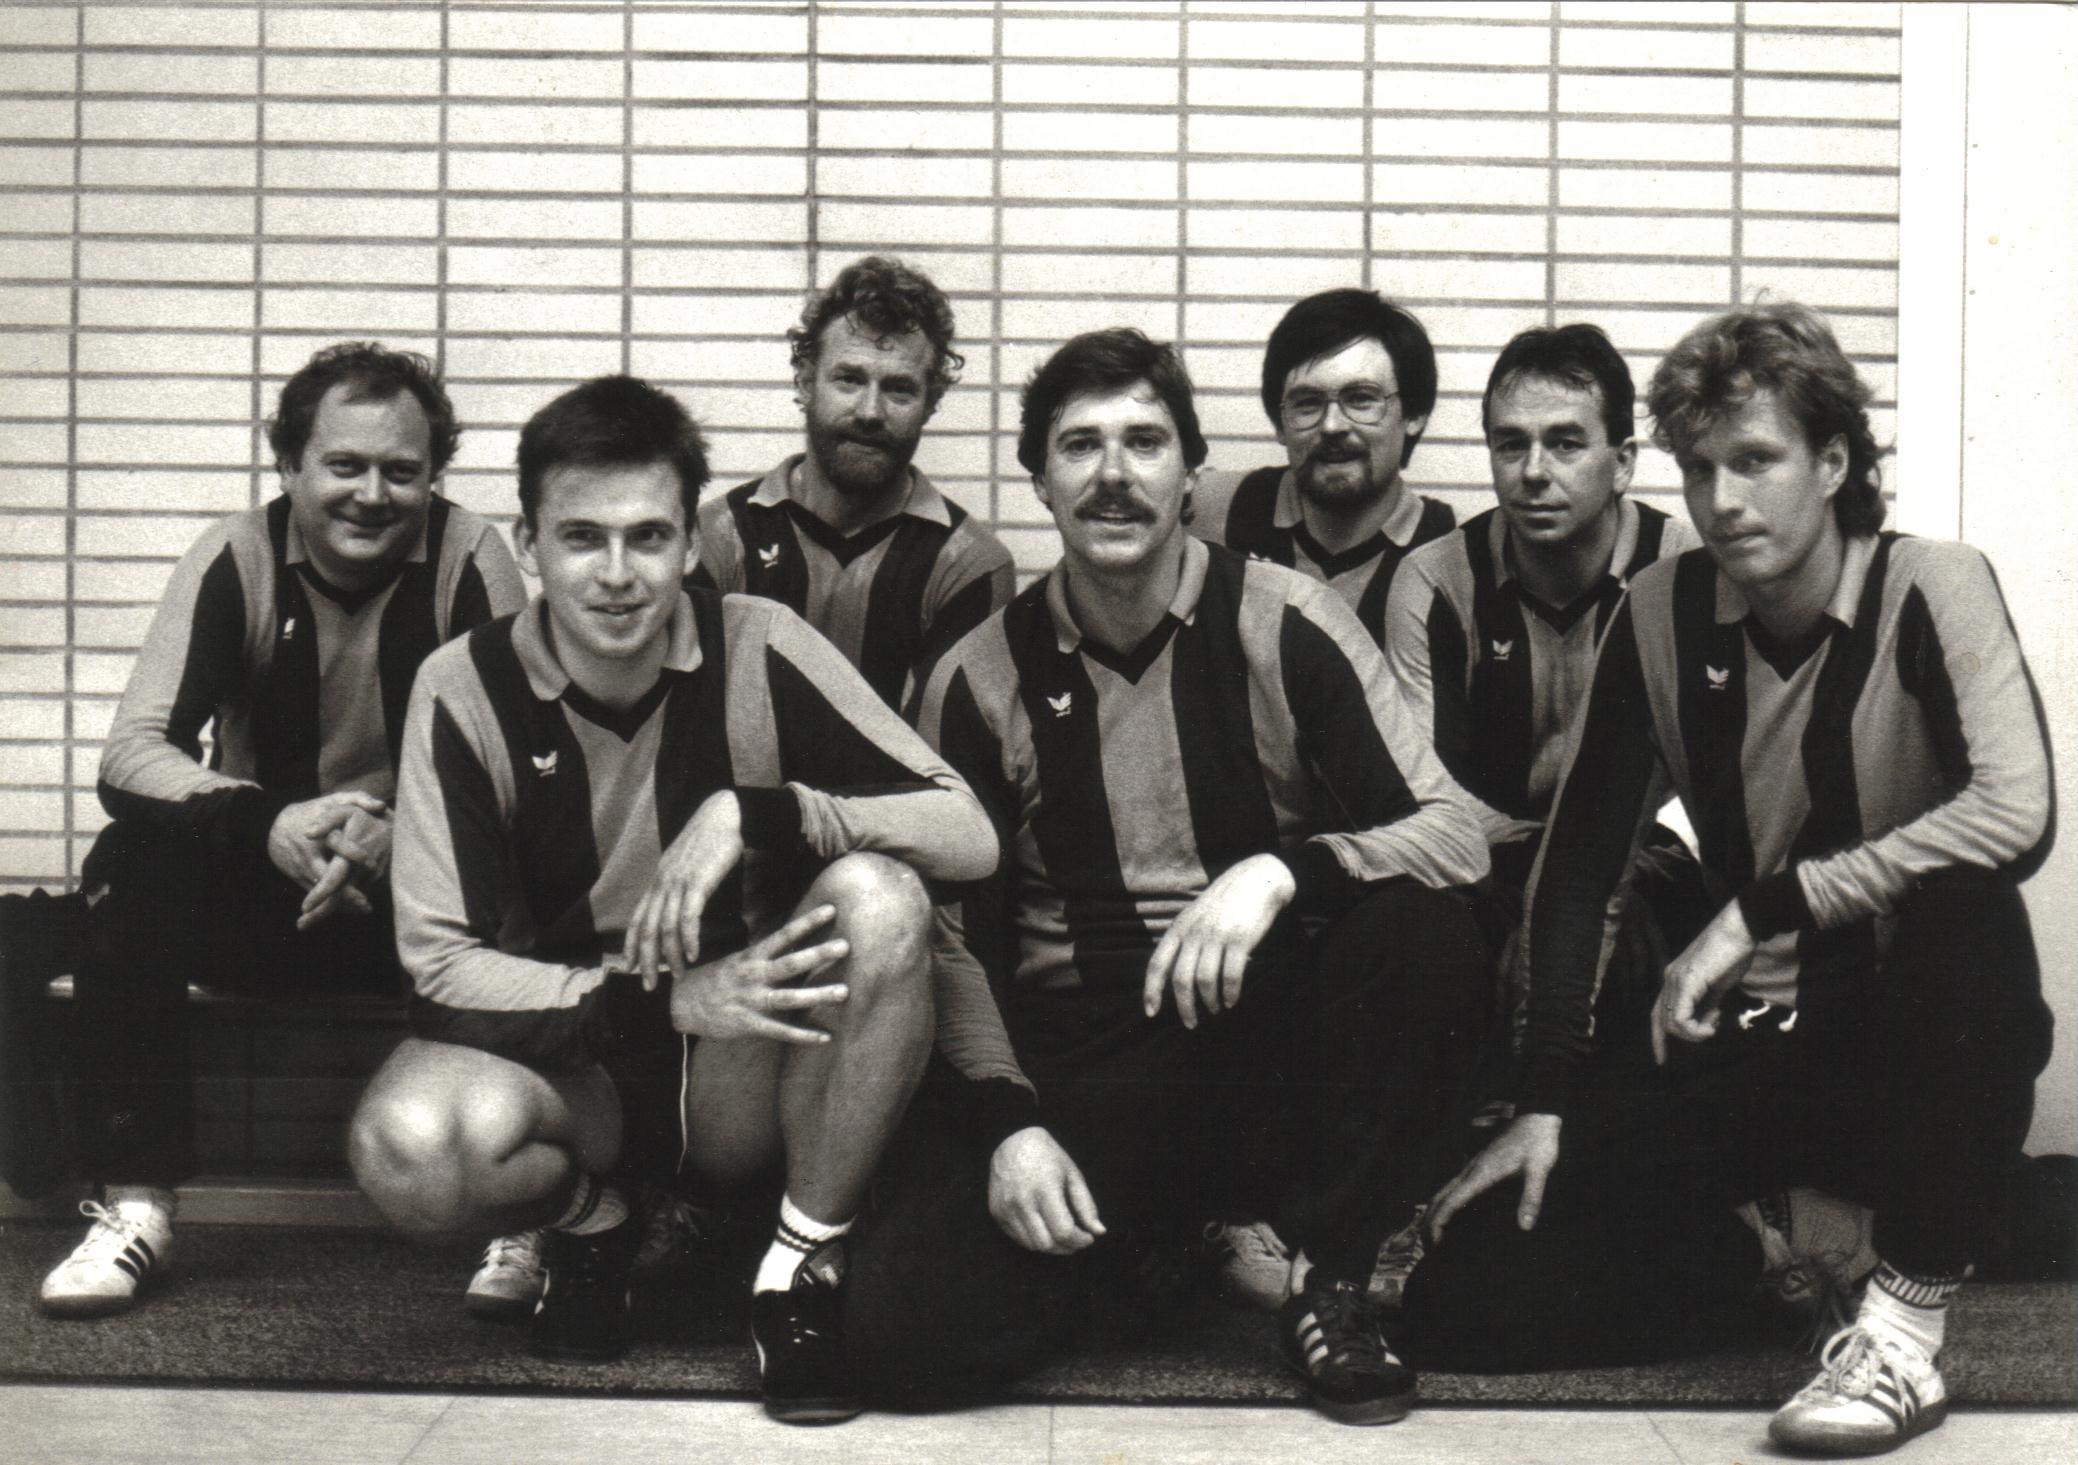 Vfk Männer 1980